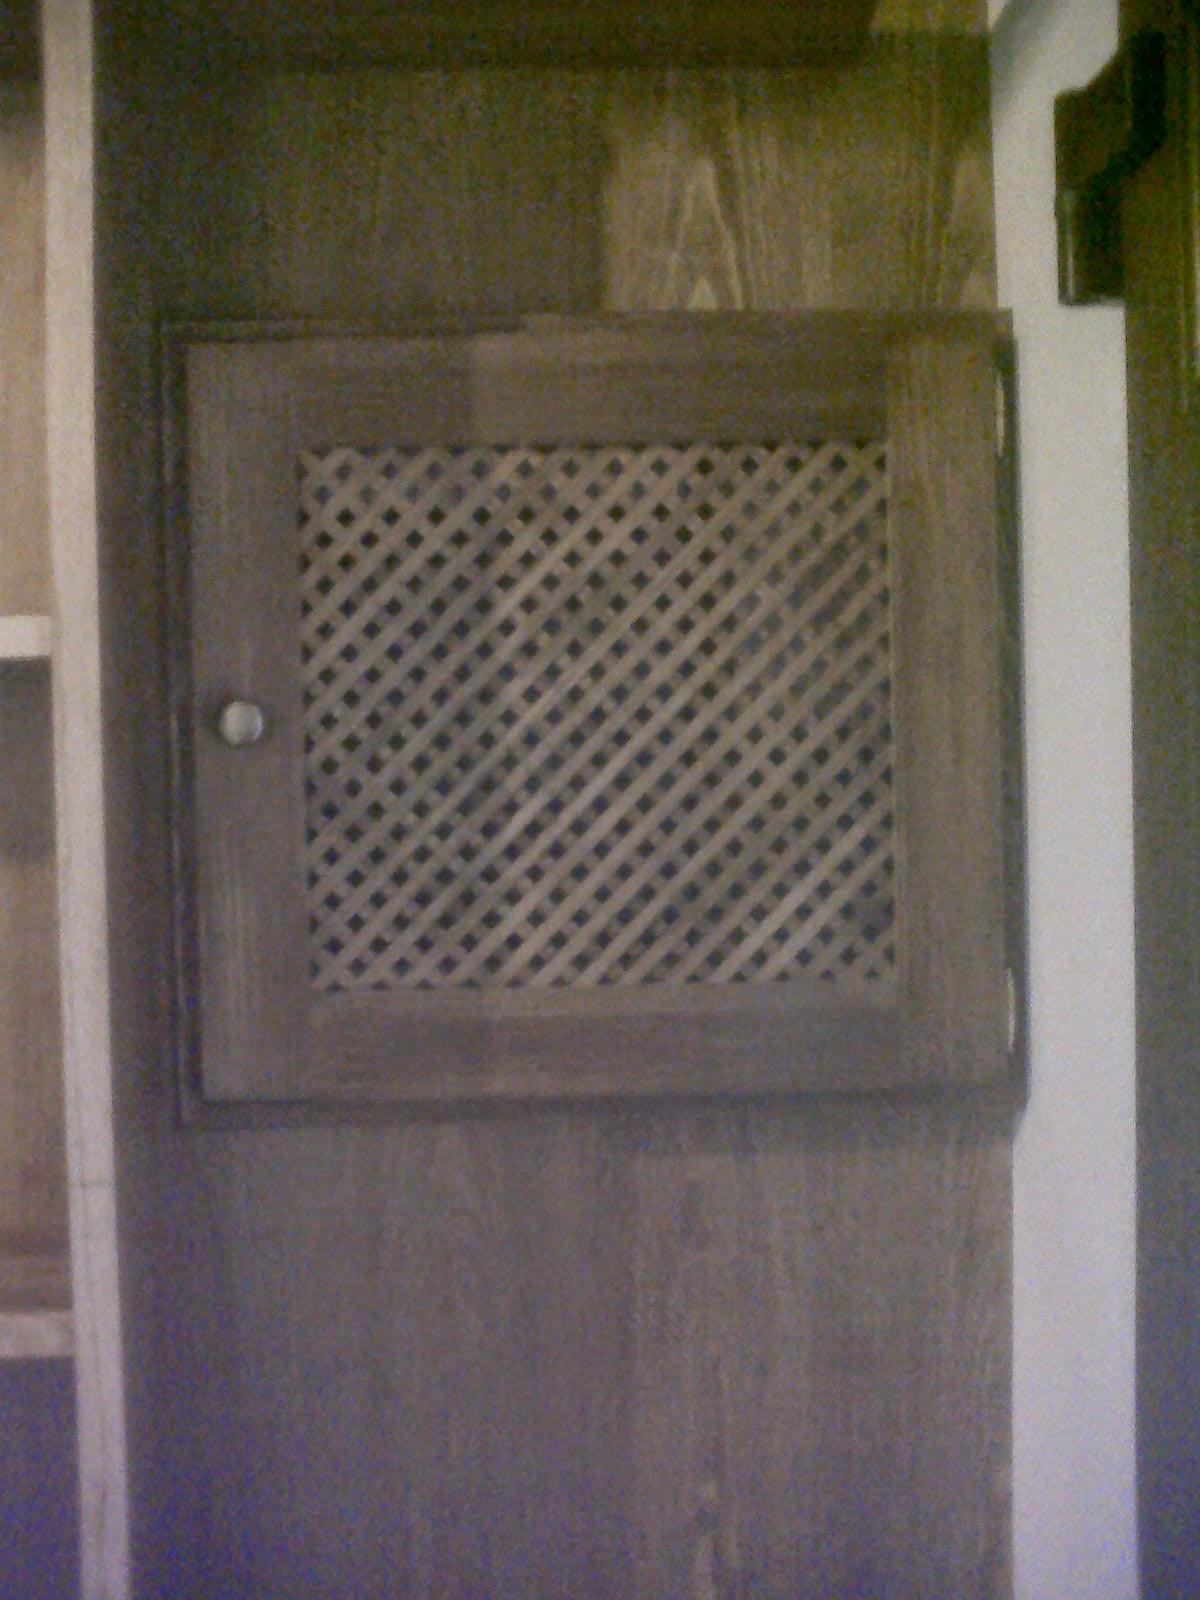 Carpinteria viosca roda mueble recibidor for Mueble recibidor colgado